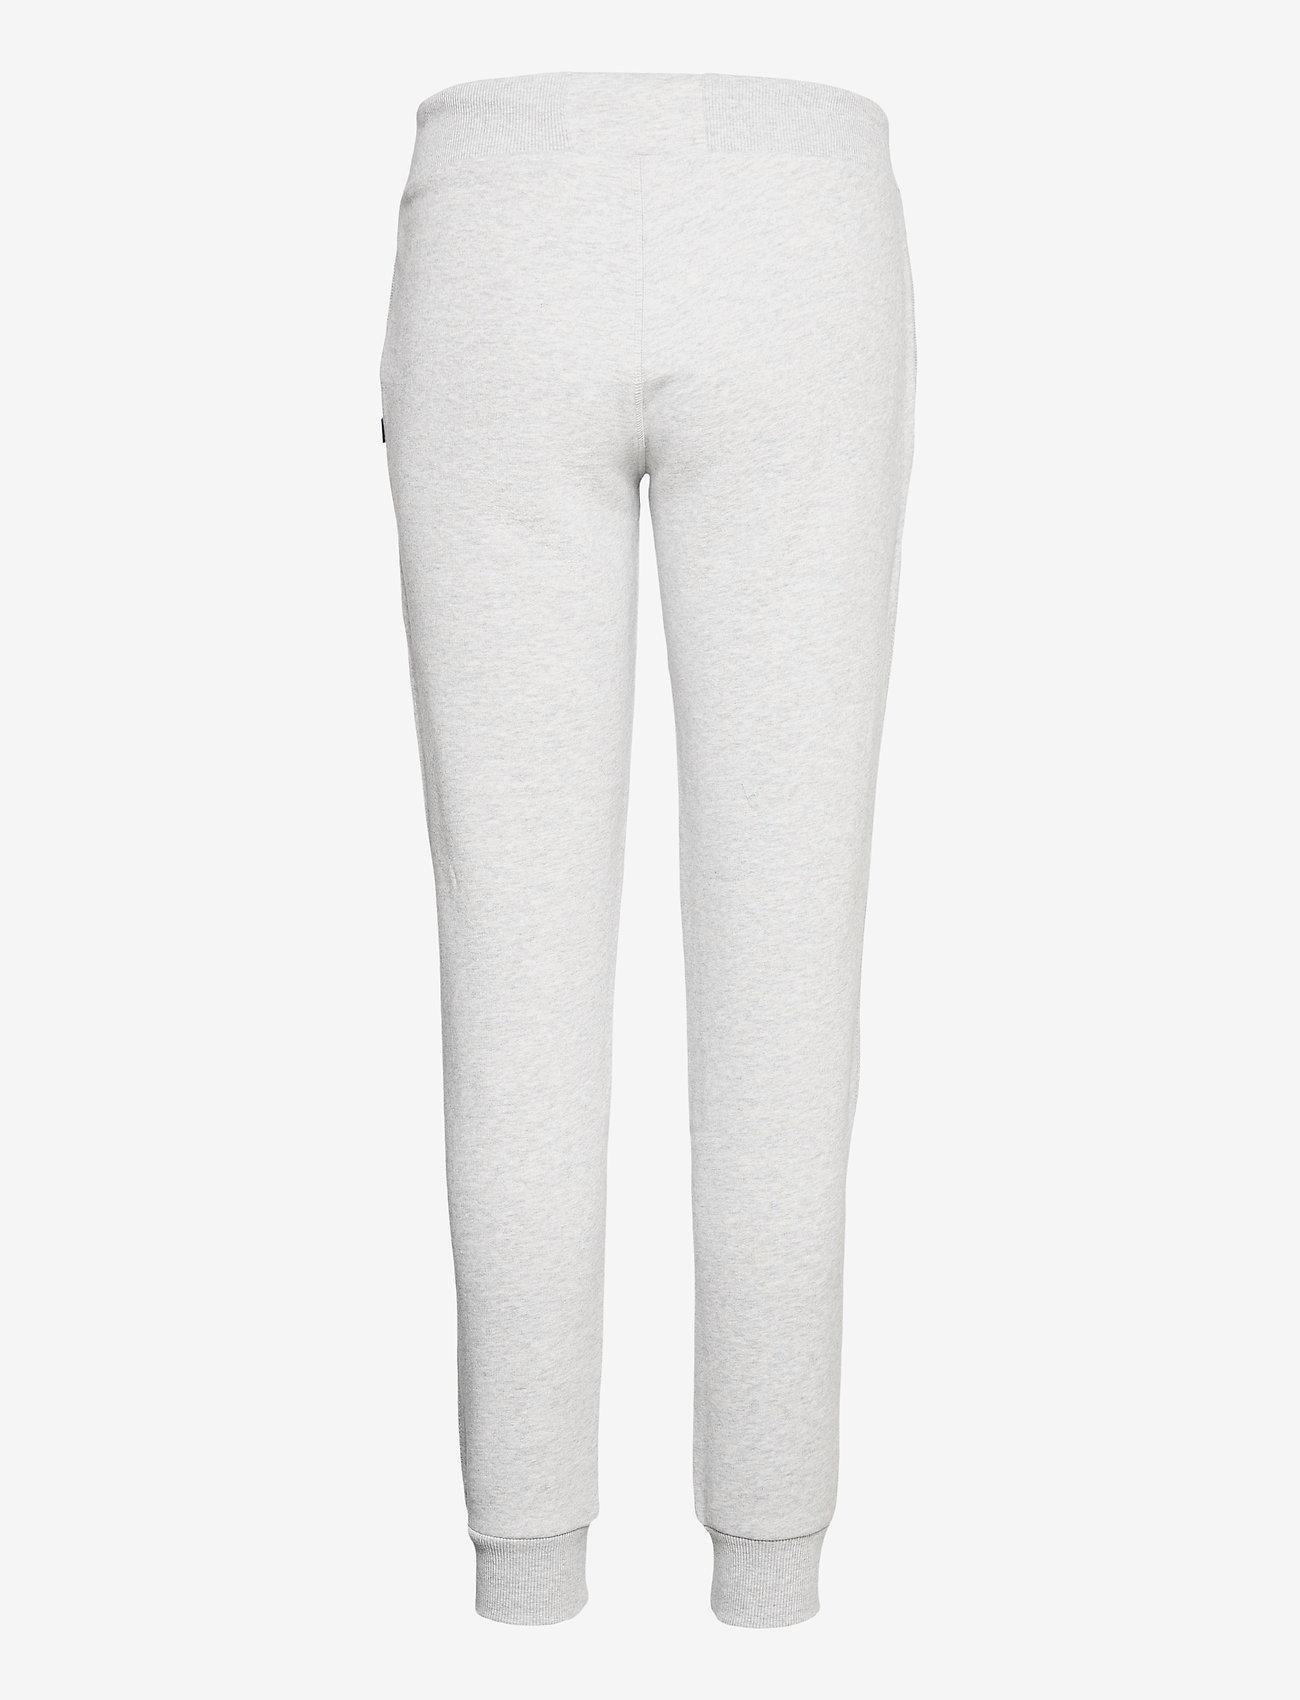 Superdry - OL CLASSIC JOGGER - sweatpants - light grey marl - 1